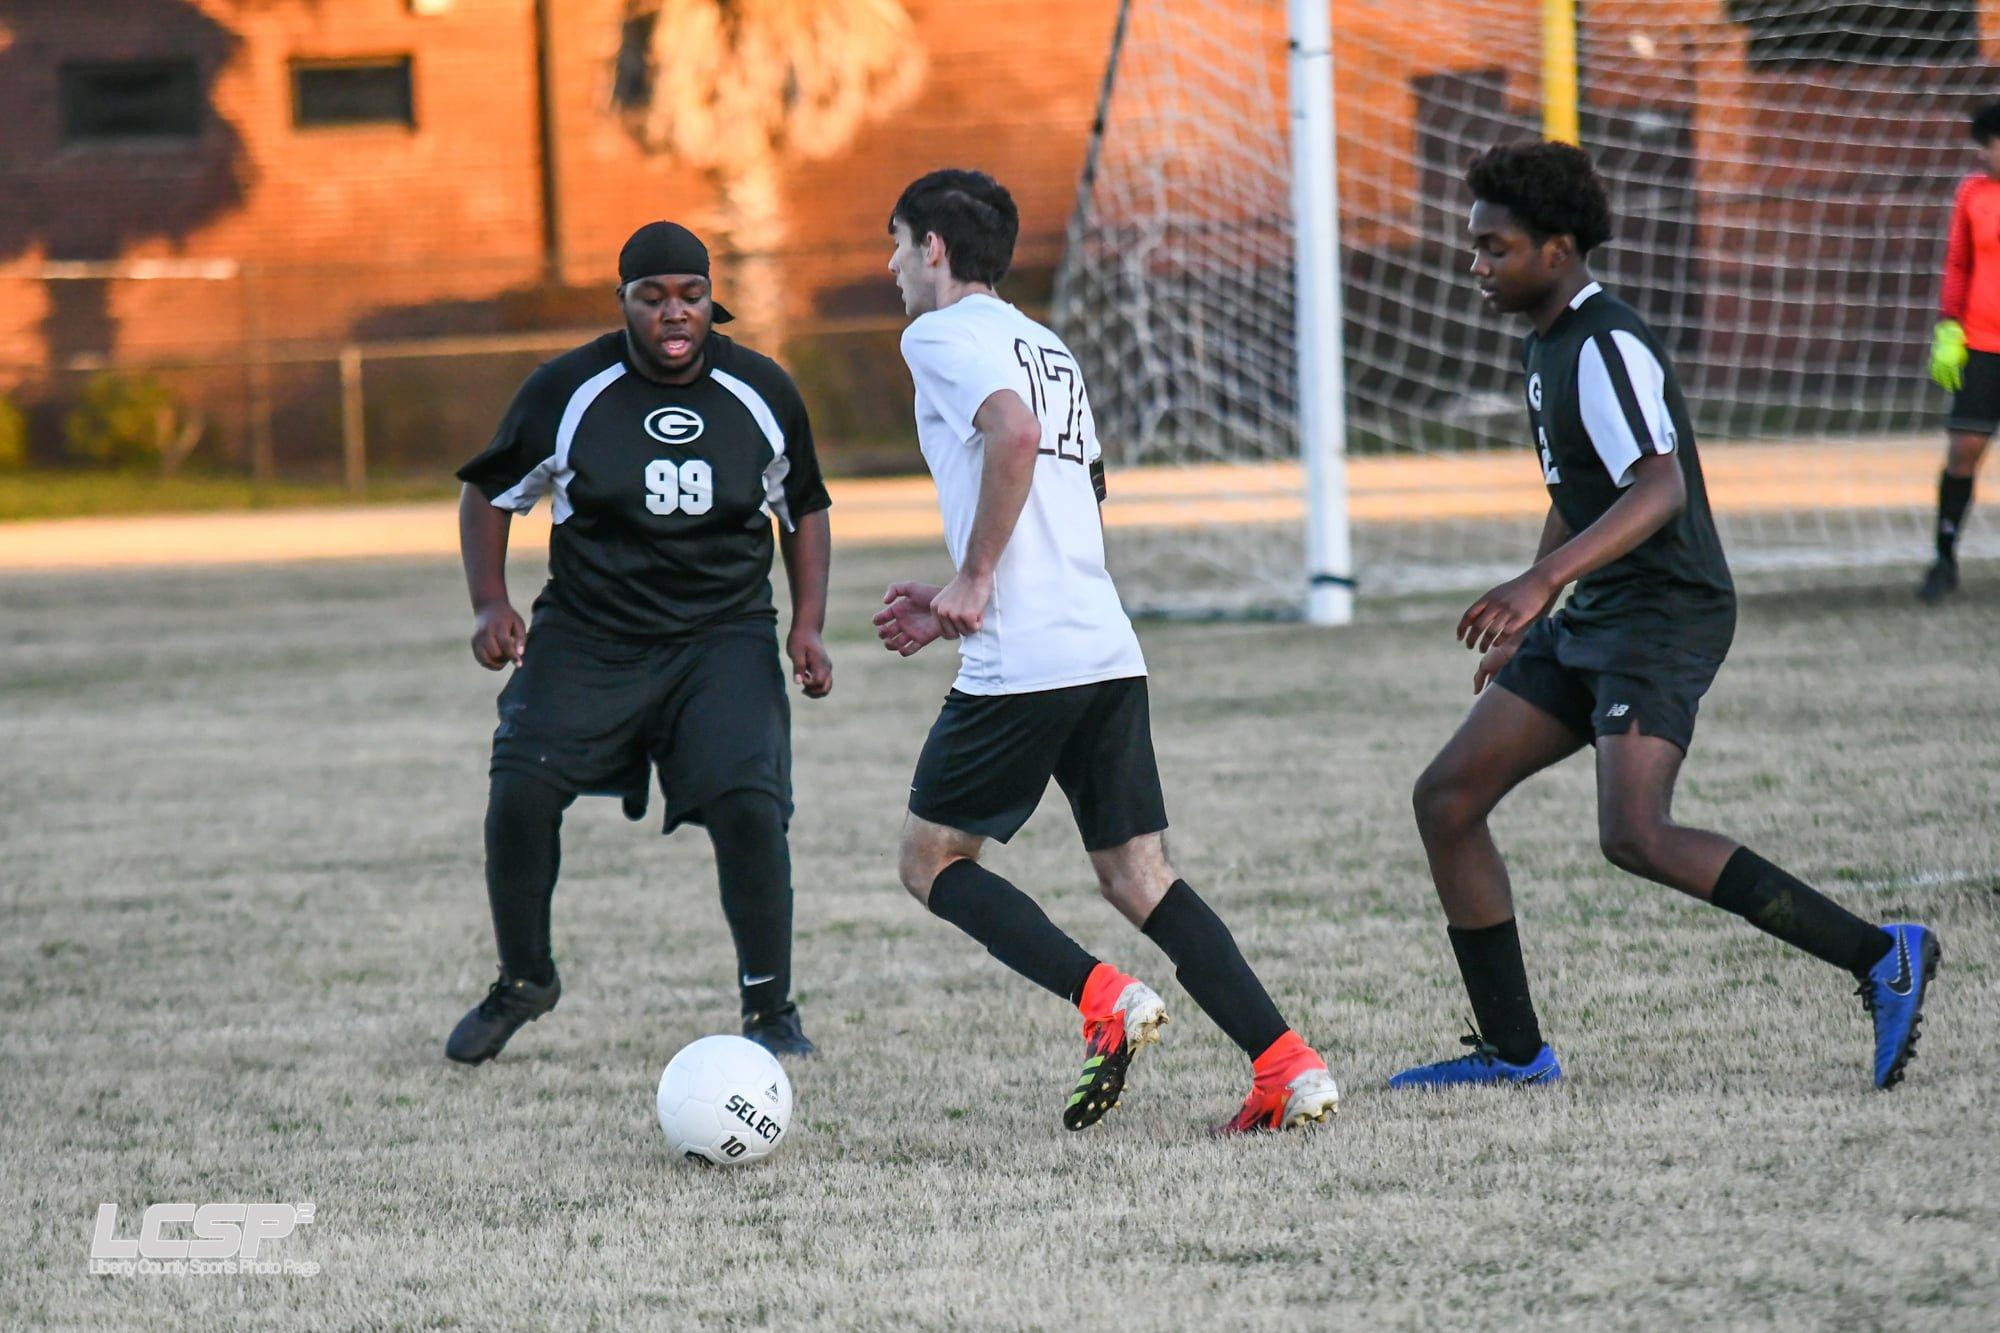 soccerboys3